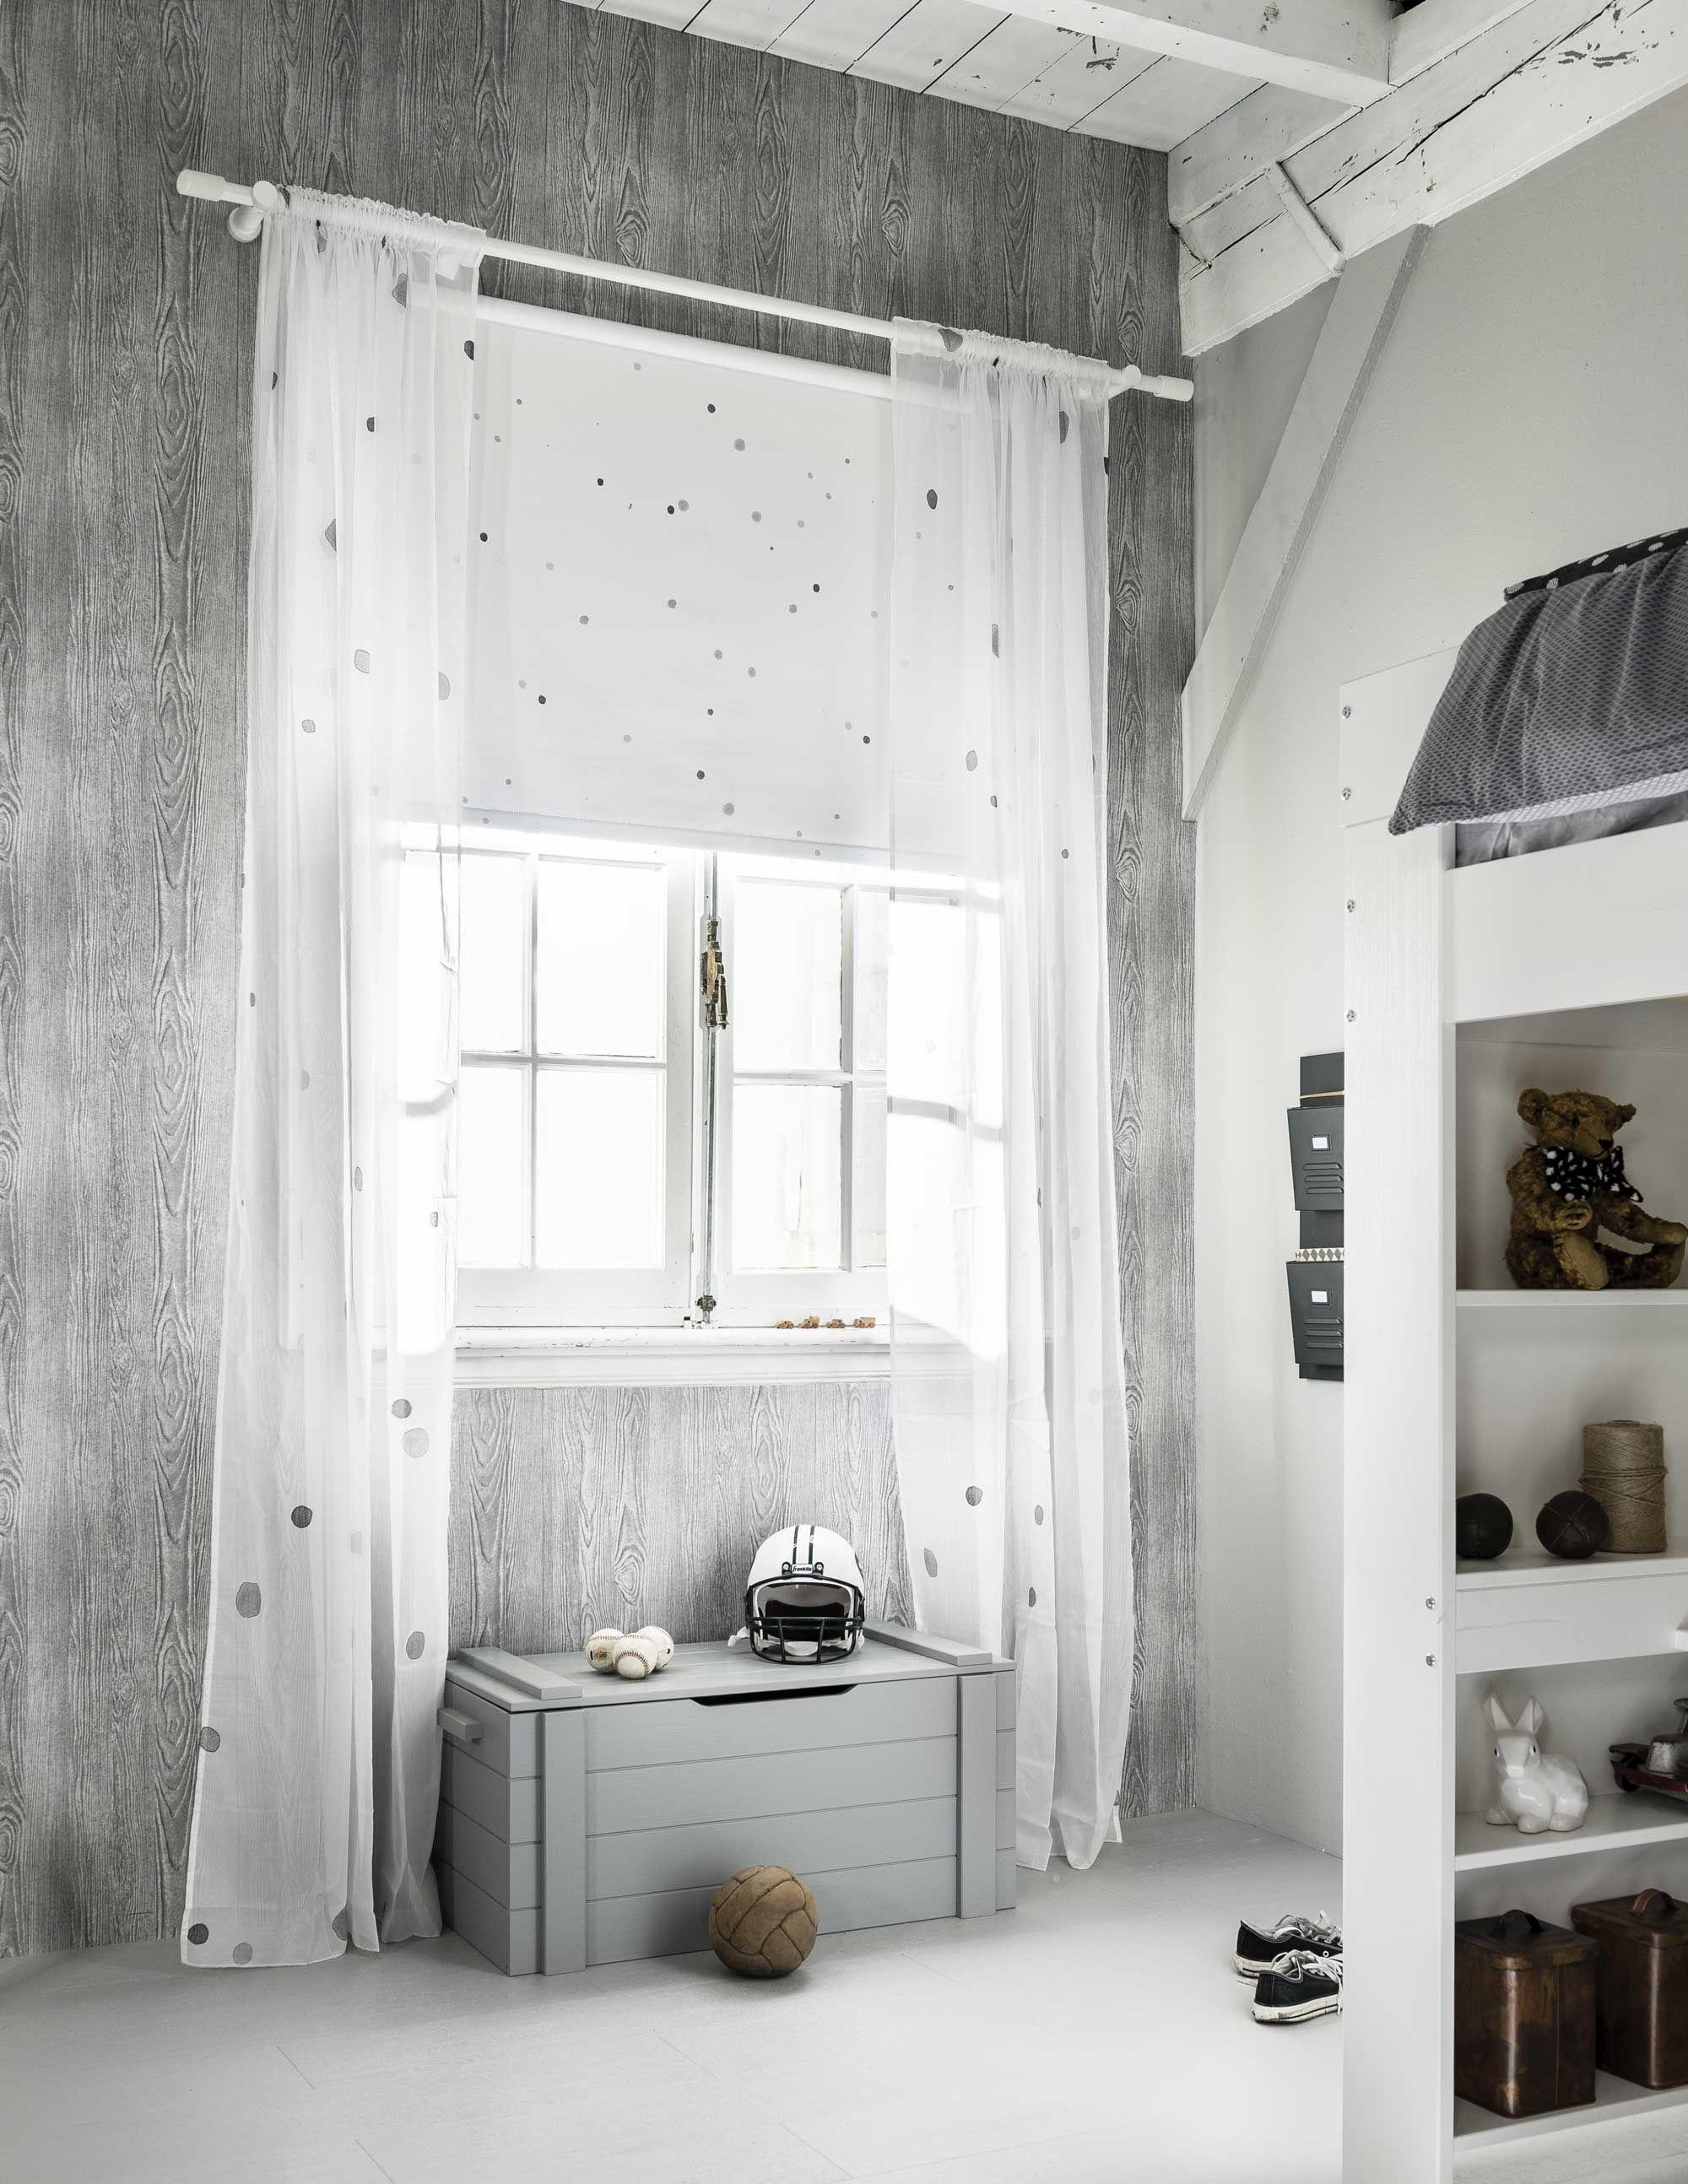 slaapkamerkarweiraamdecoratie slaapkamer roan